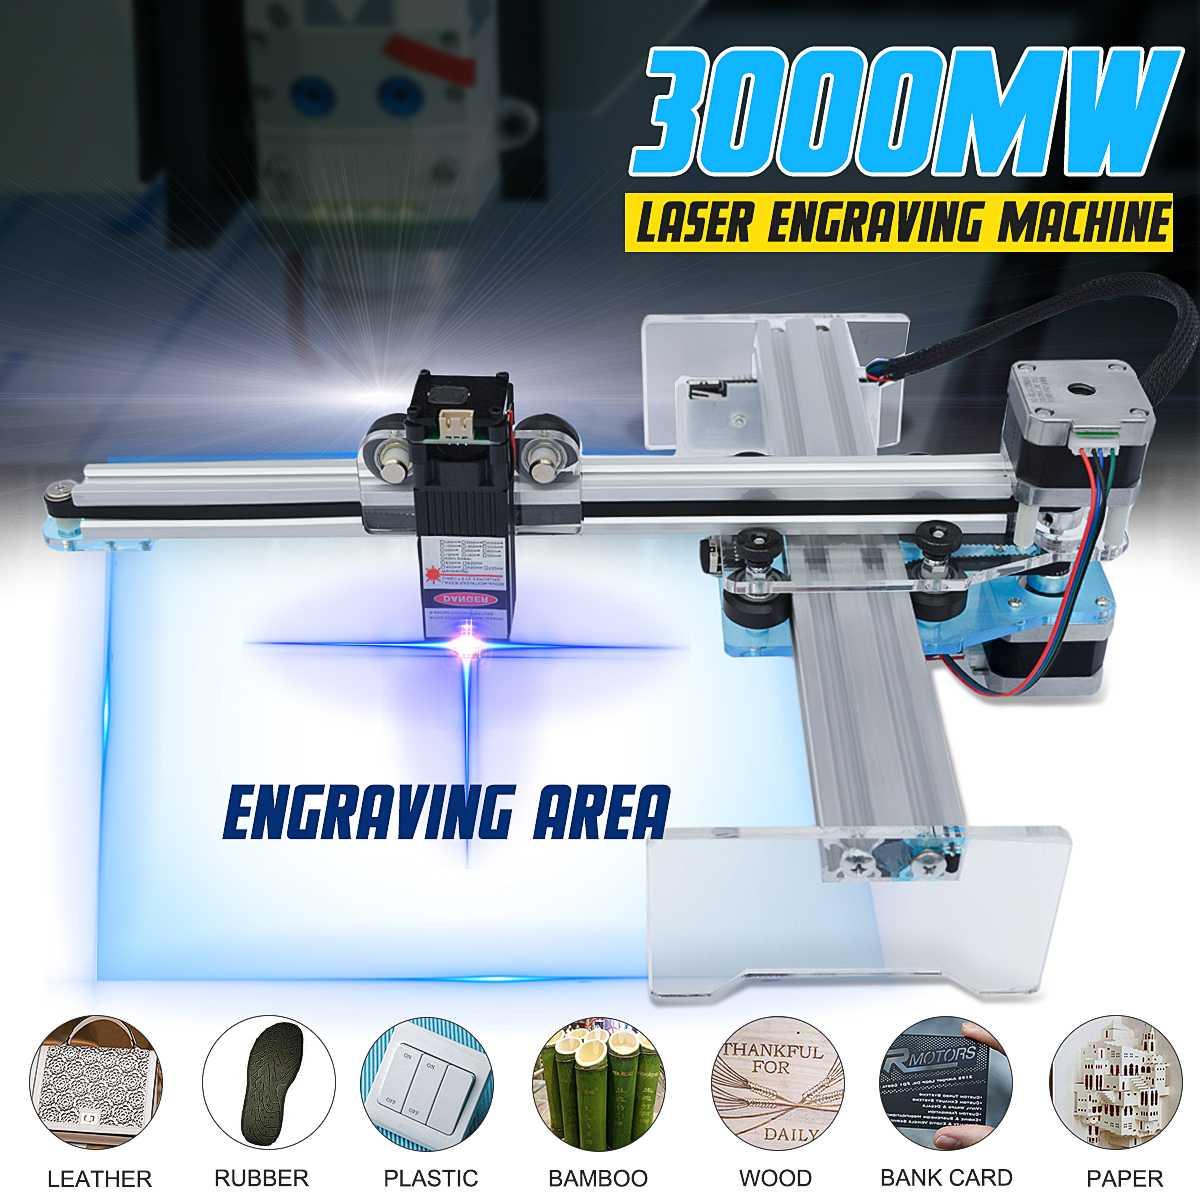 405nm 3000mW CNC Laser Wood Engraving Machine Laser Cutting Engraving Machine DIY Desktop Wood Cutter/Printer High Quality